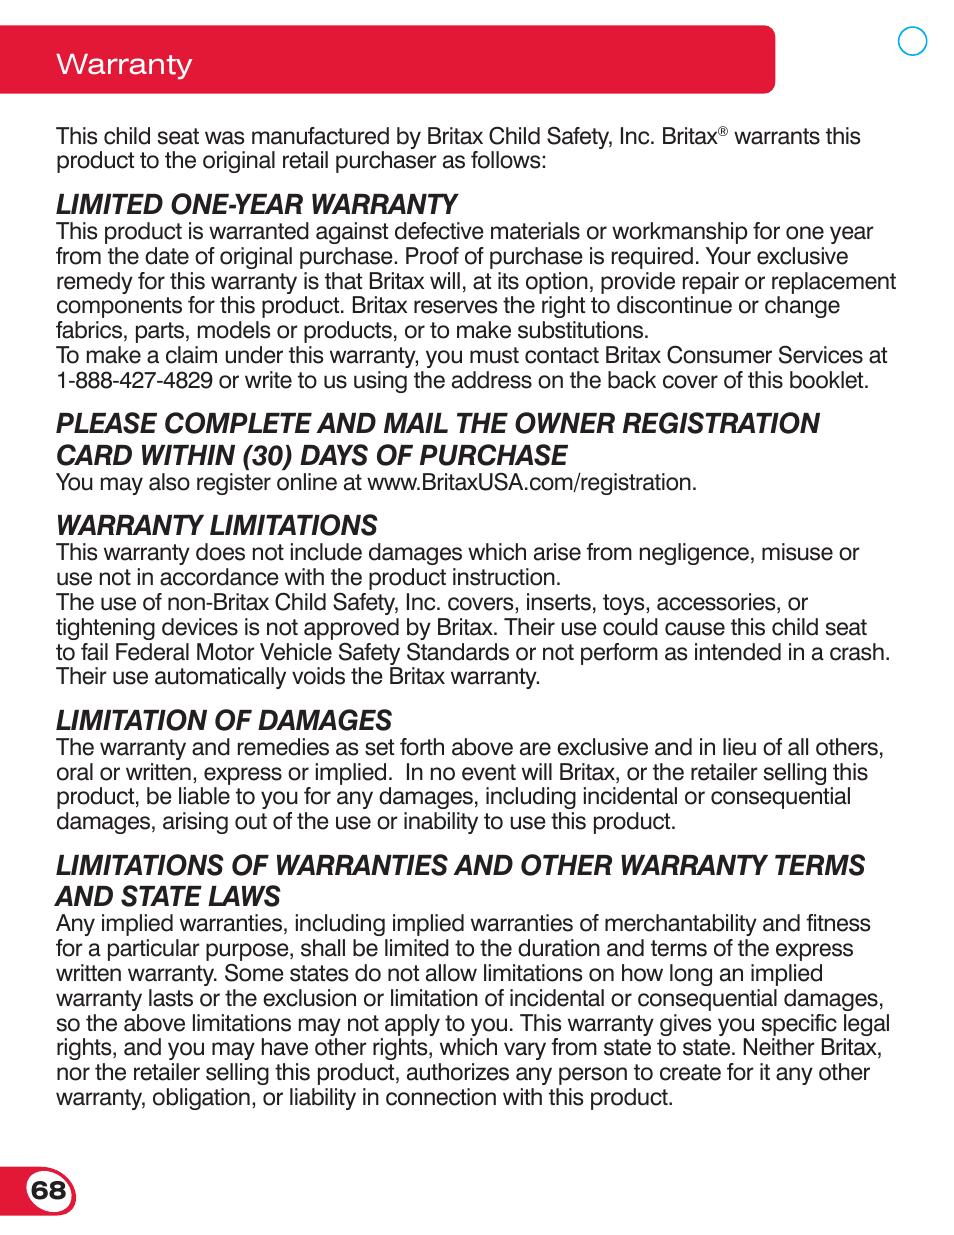 Limited one-year warranty, Warranty limitations, Limitation of damages |  Warranty | Britax